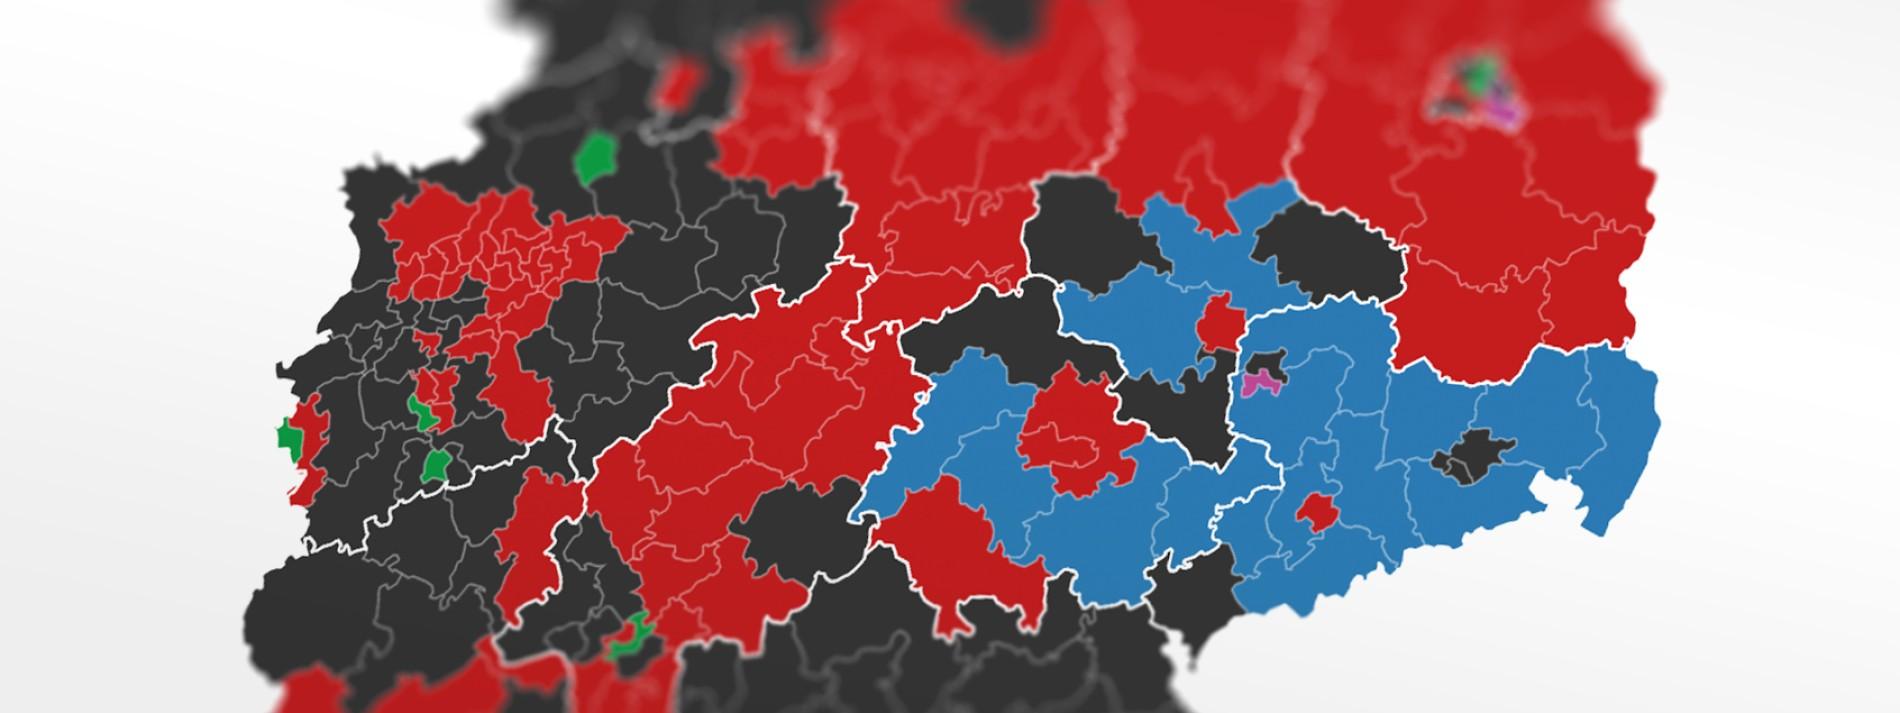 Alle Ergebnisse der Bundestagswahl 2021